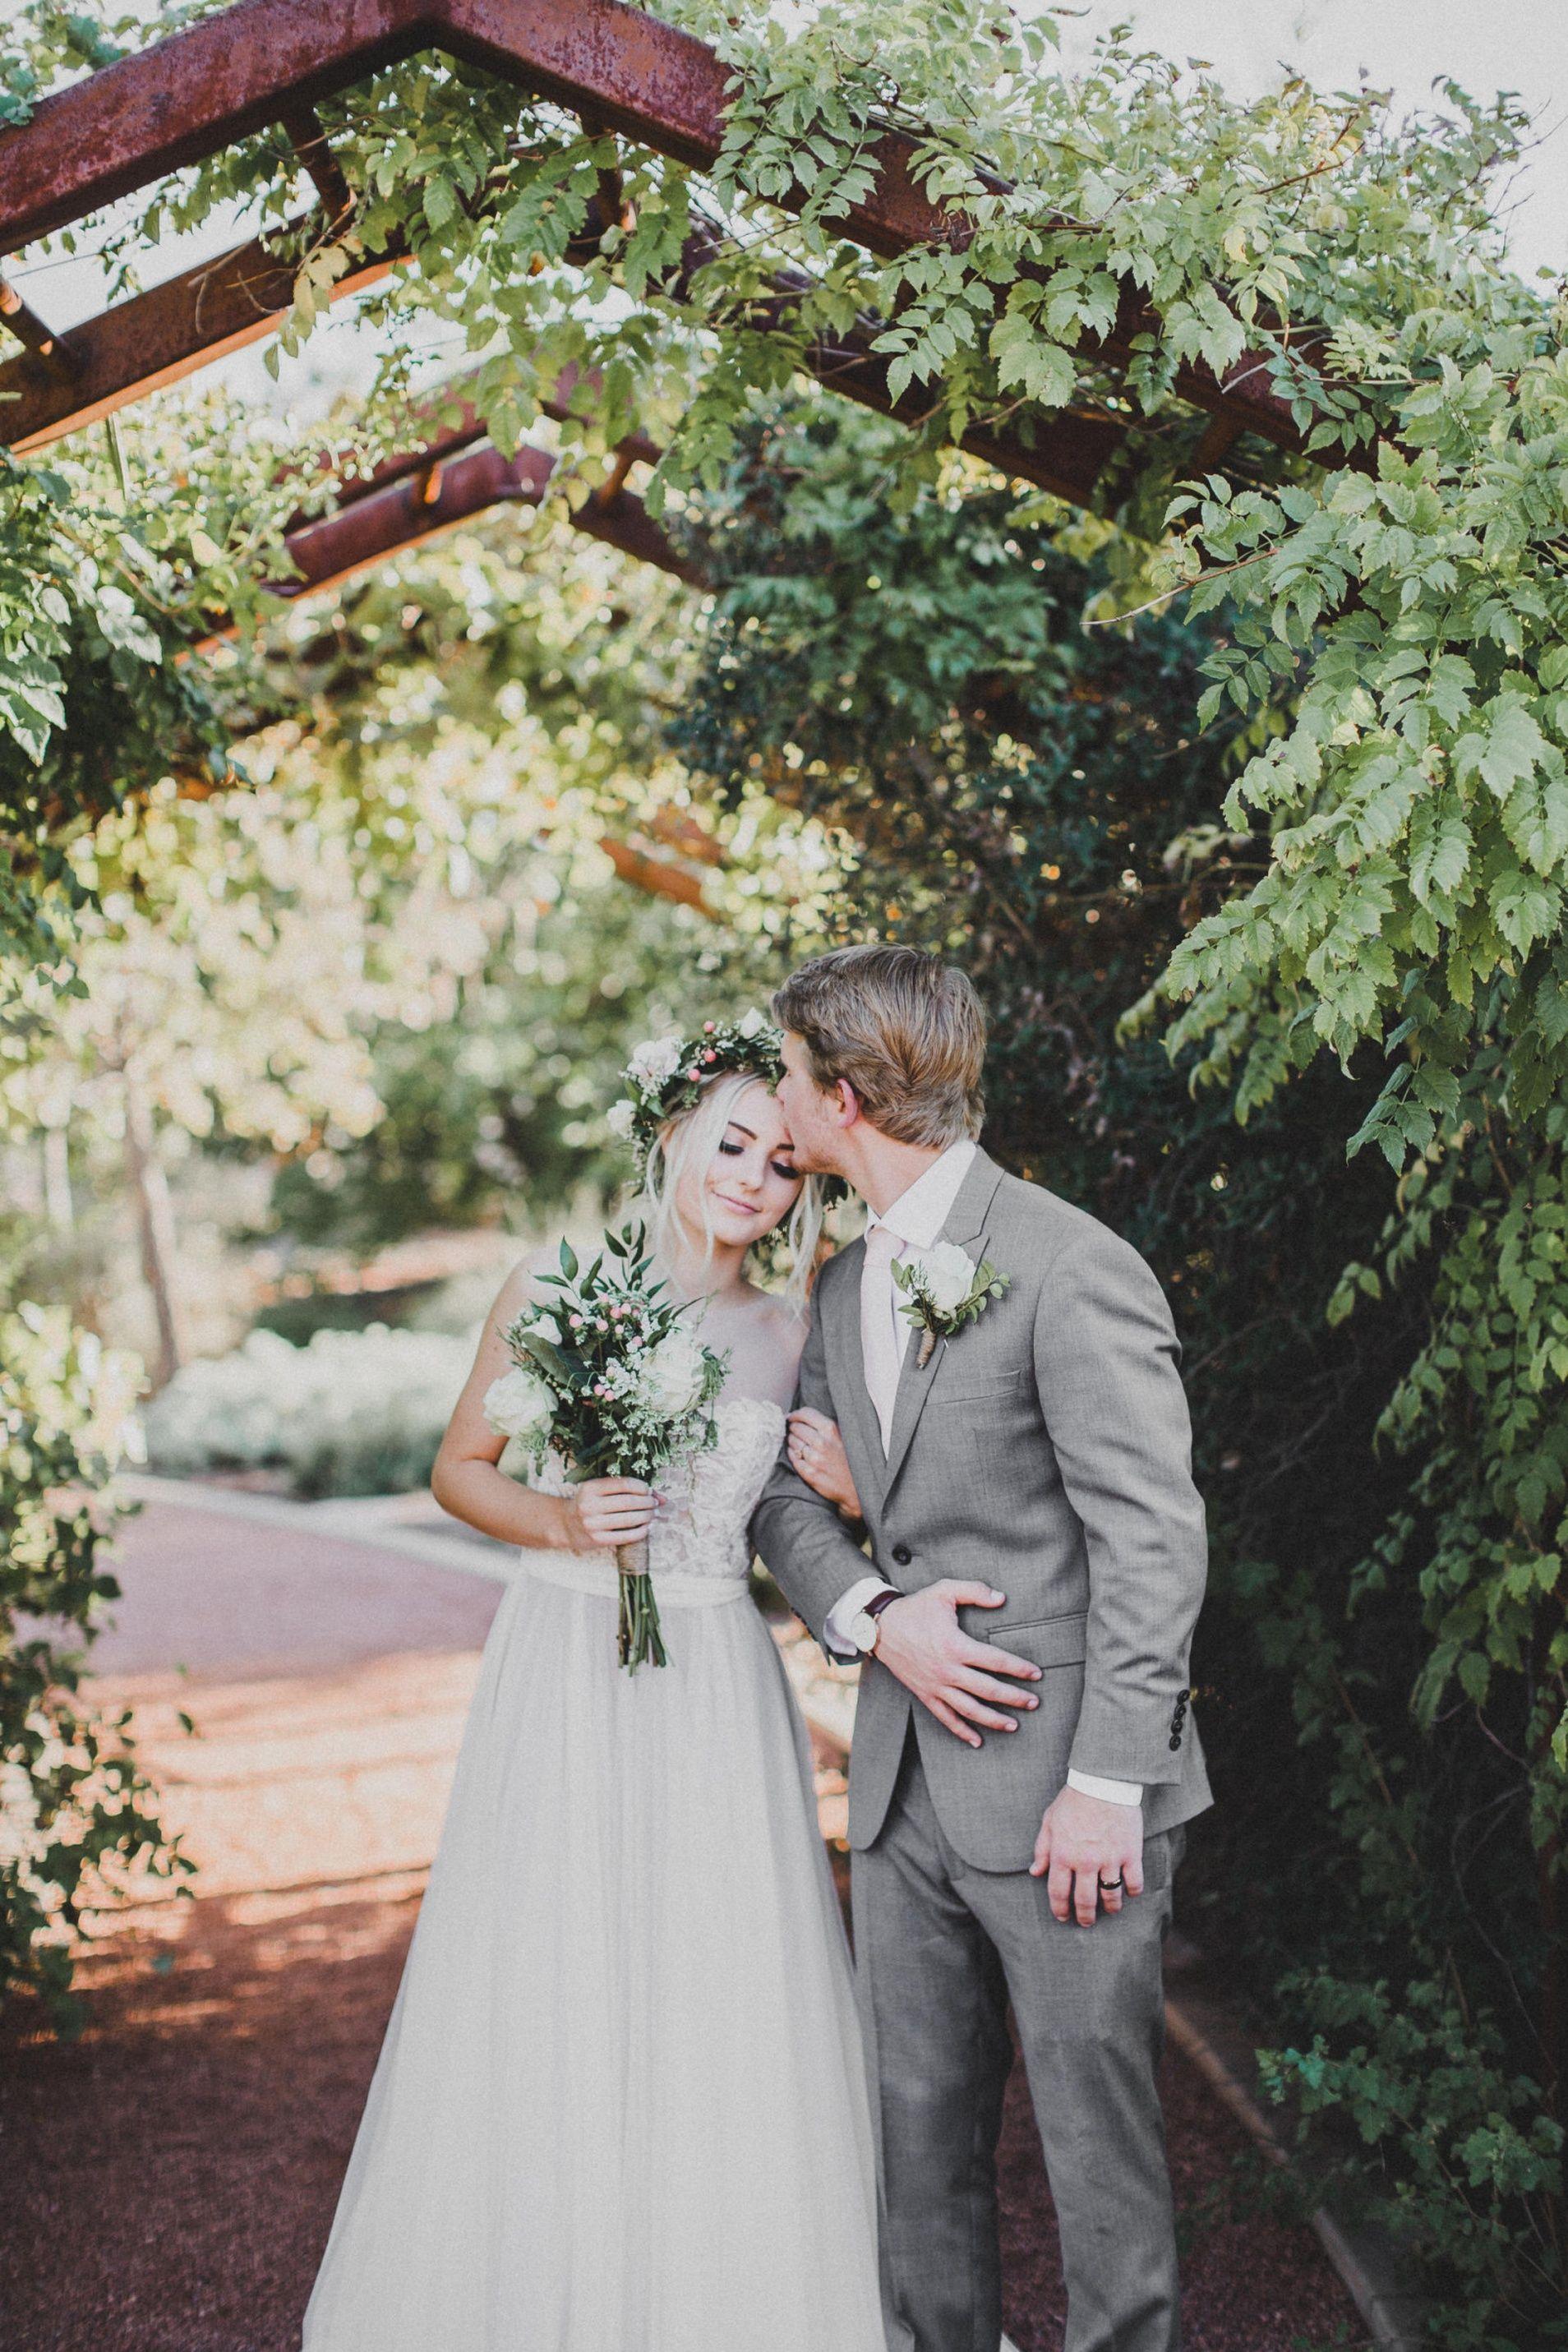 Aspyn + Parker, Tonaquint Gardens, St. George, Utah | Wedding ...